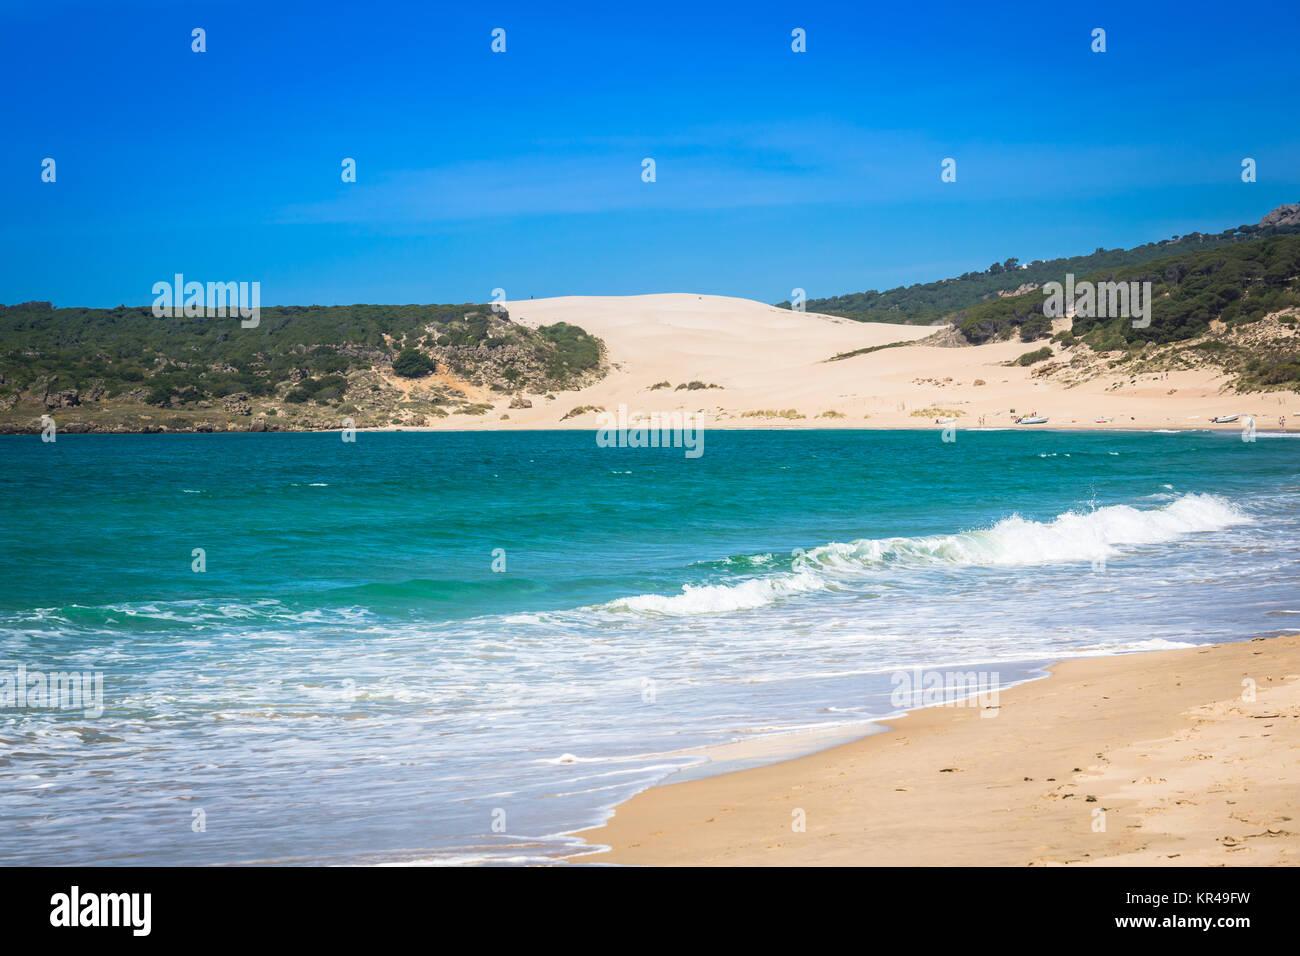 sand dune of bolonia beach,province of cadiz,andalucia,spain Stock Photo